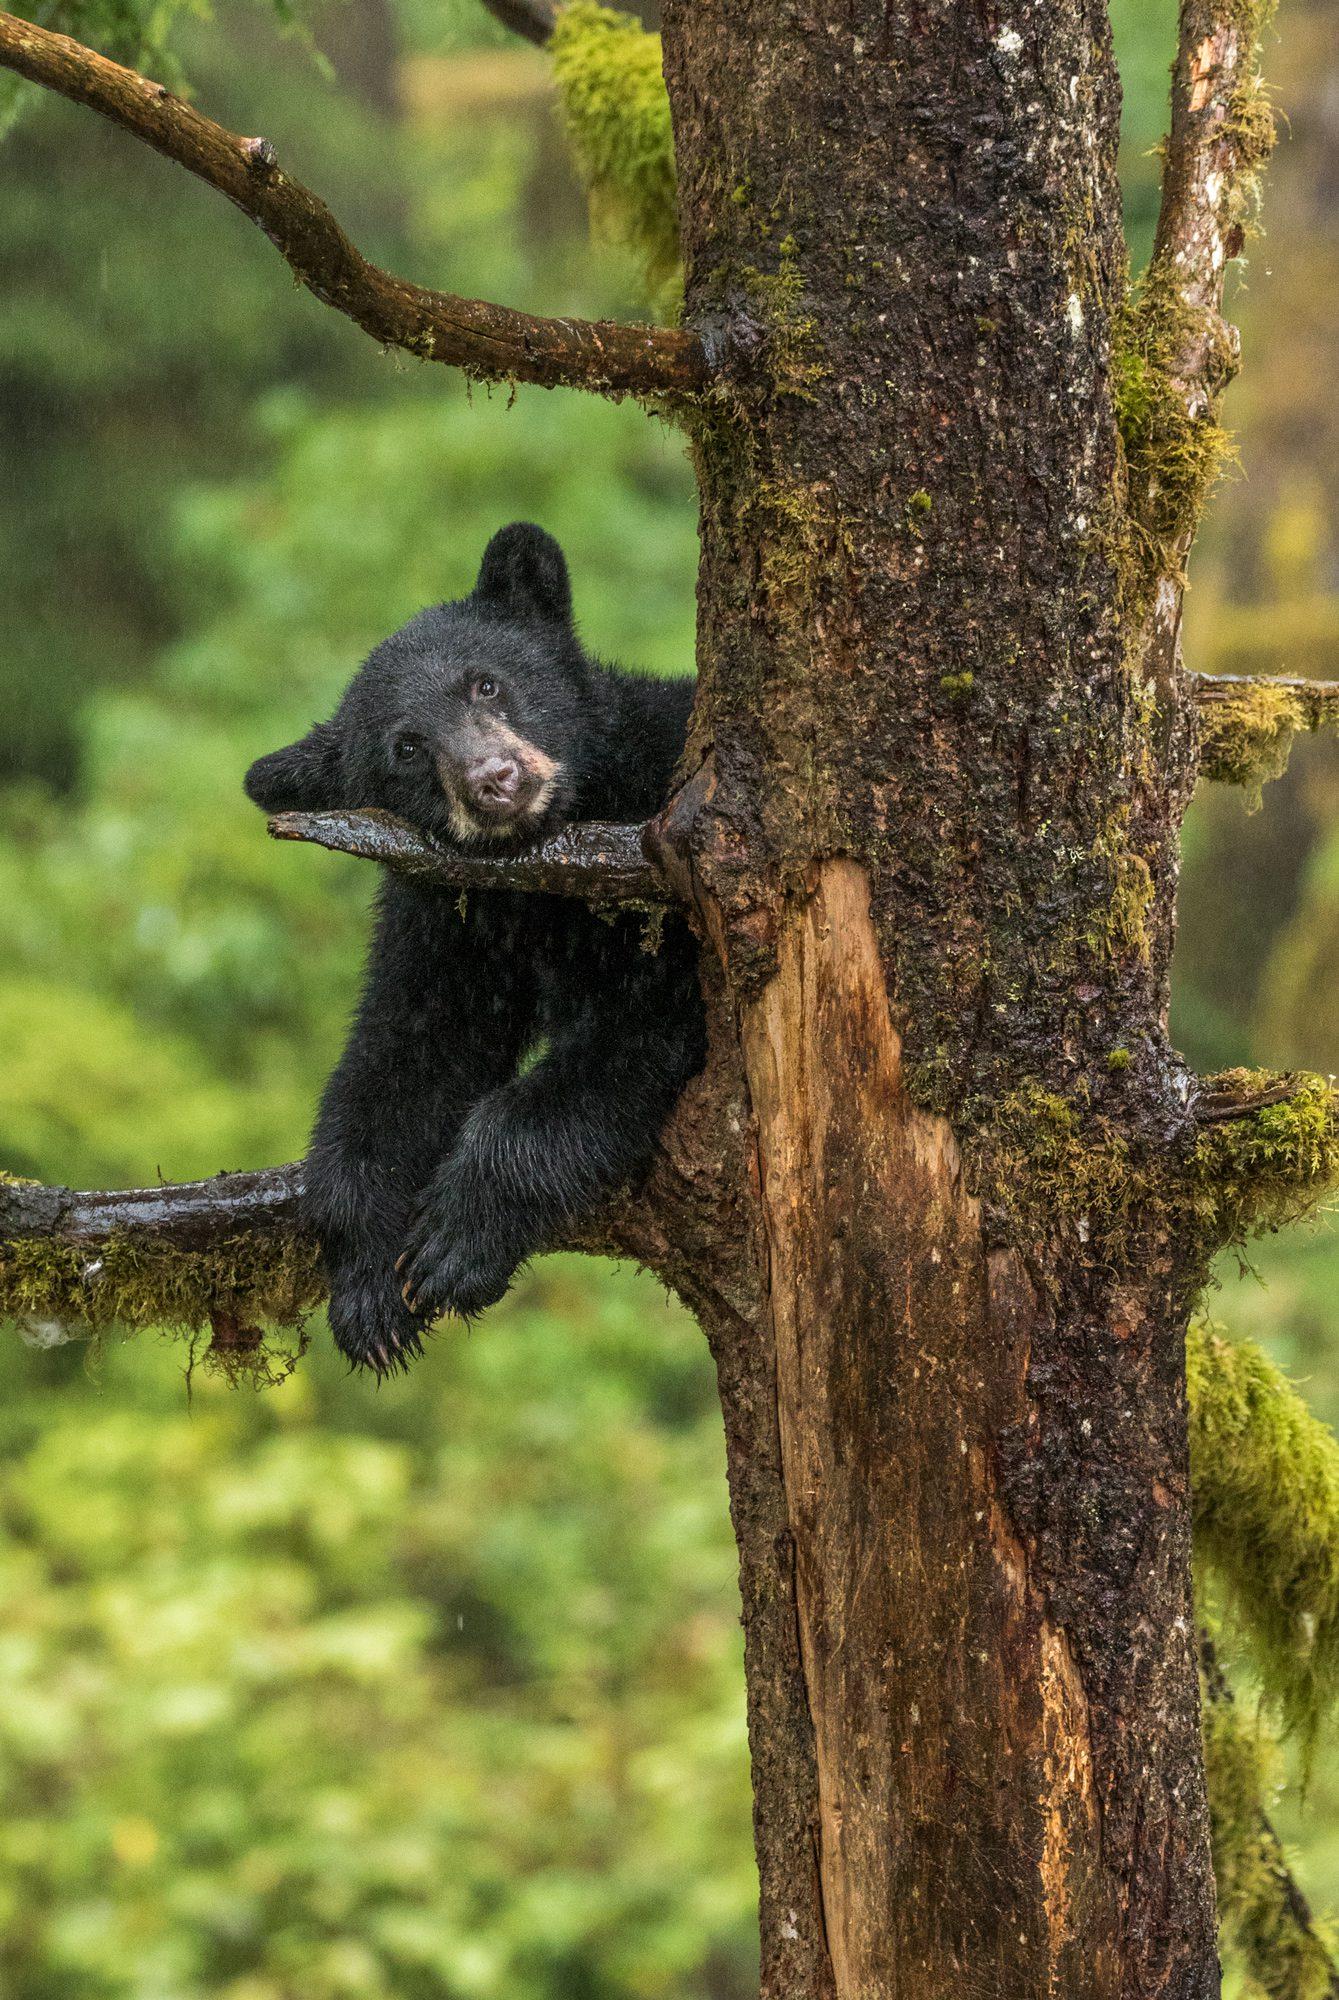 Black bear cub in a tree on a rainy day